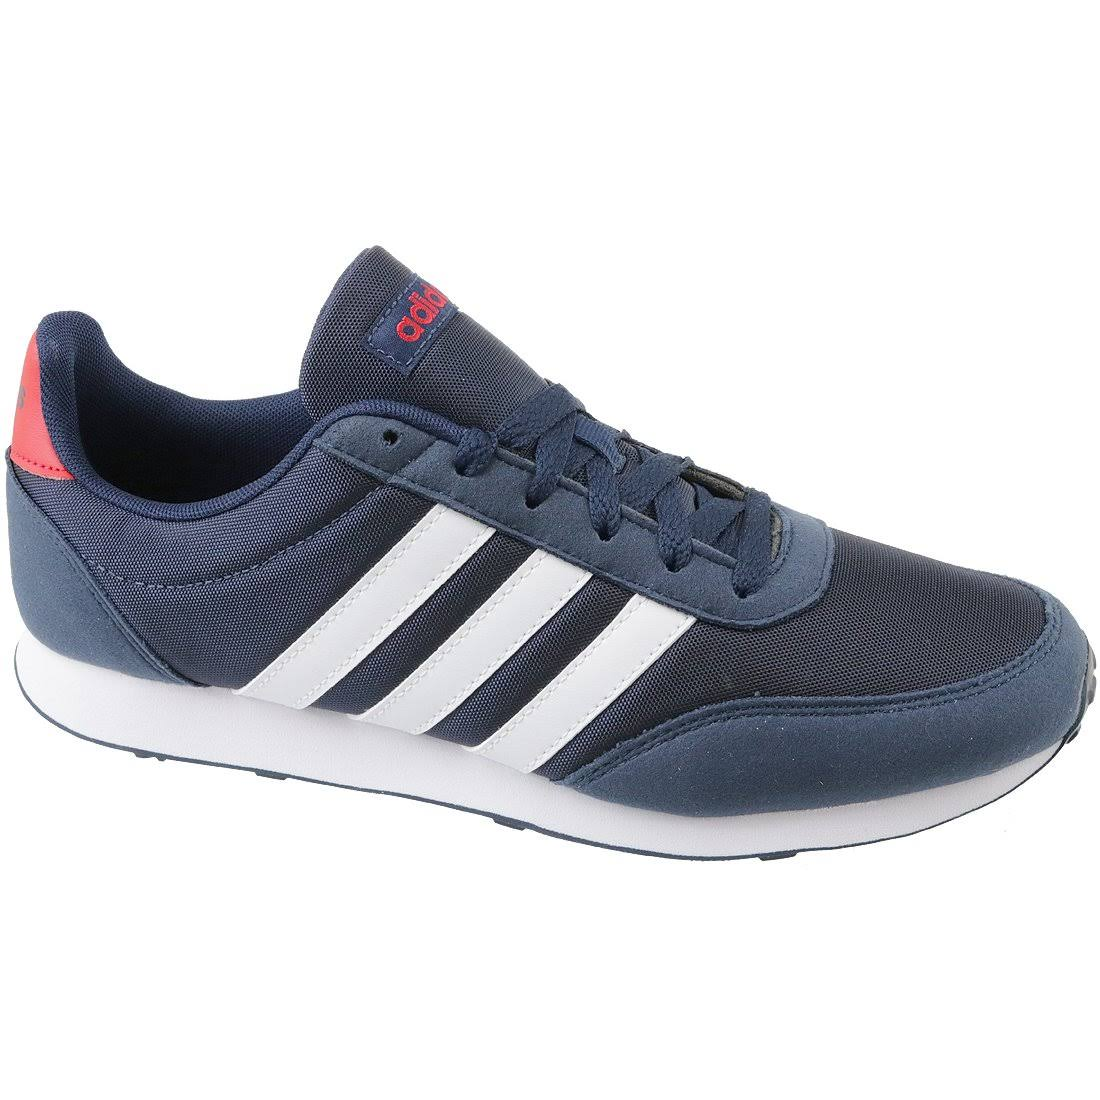 (7) Adidas V Racer 2.0 CG5706 Mens Navy Blue sneakers